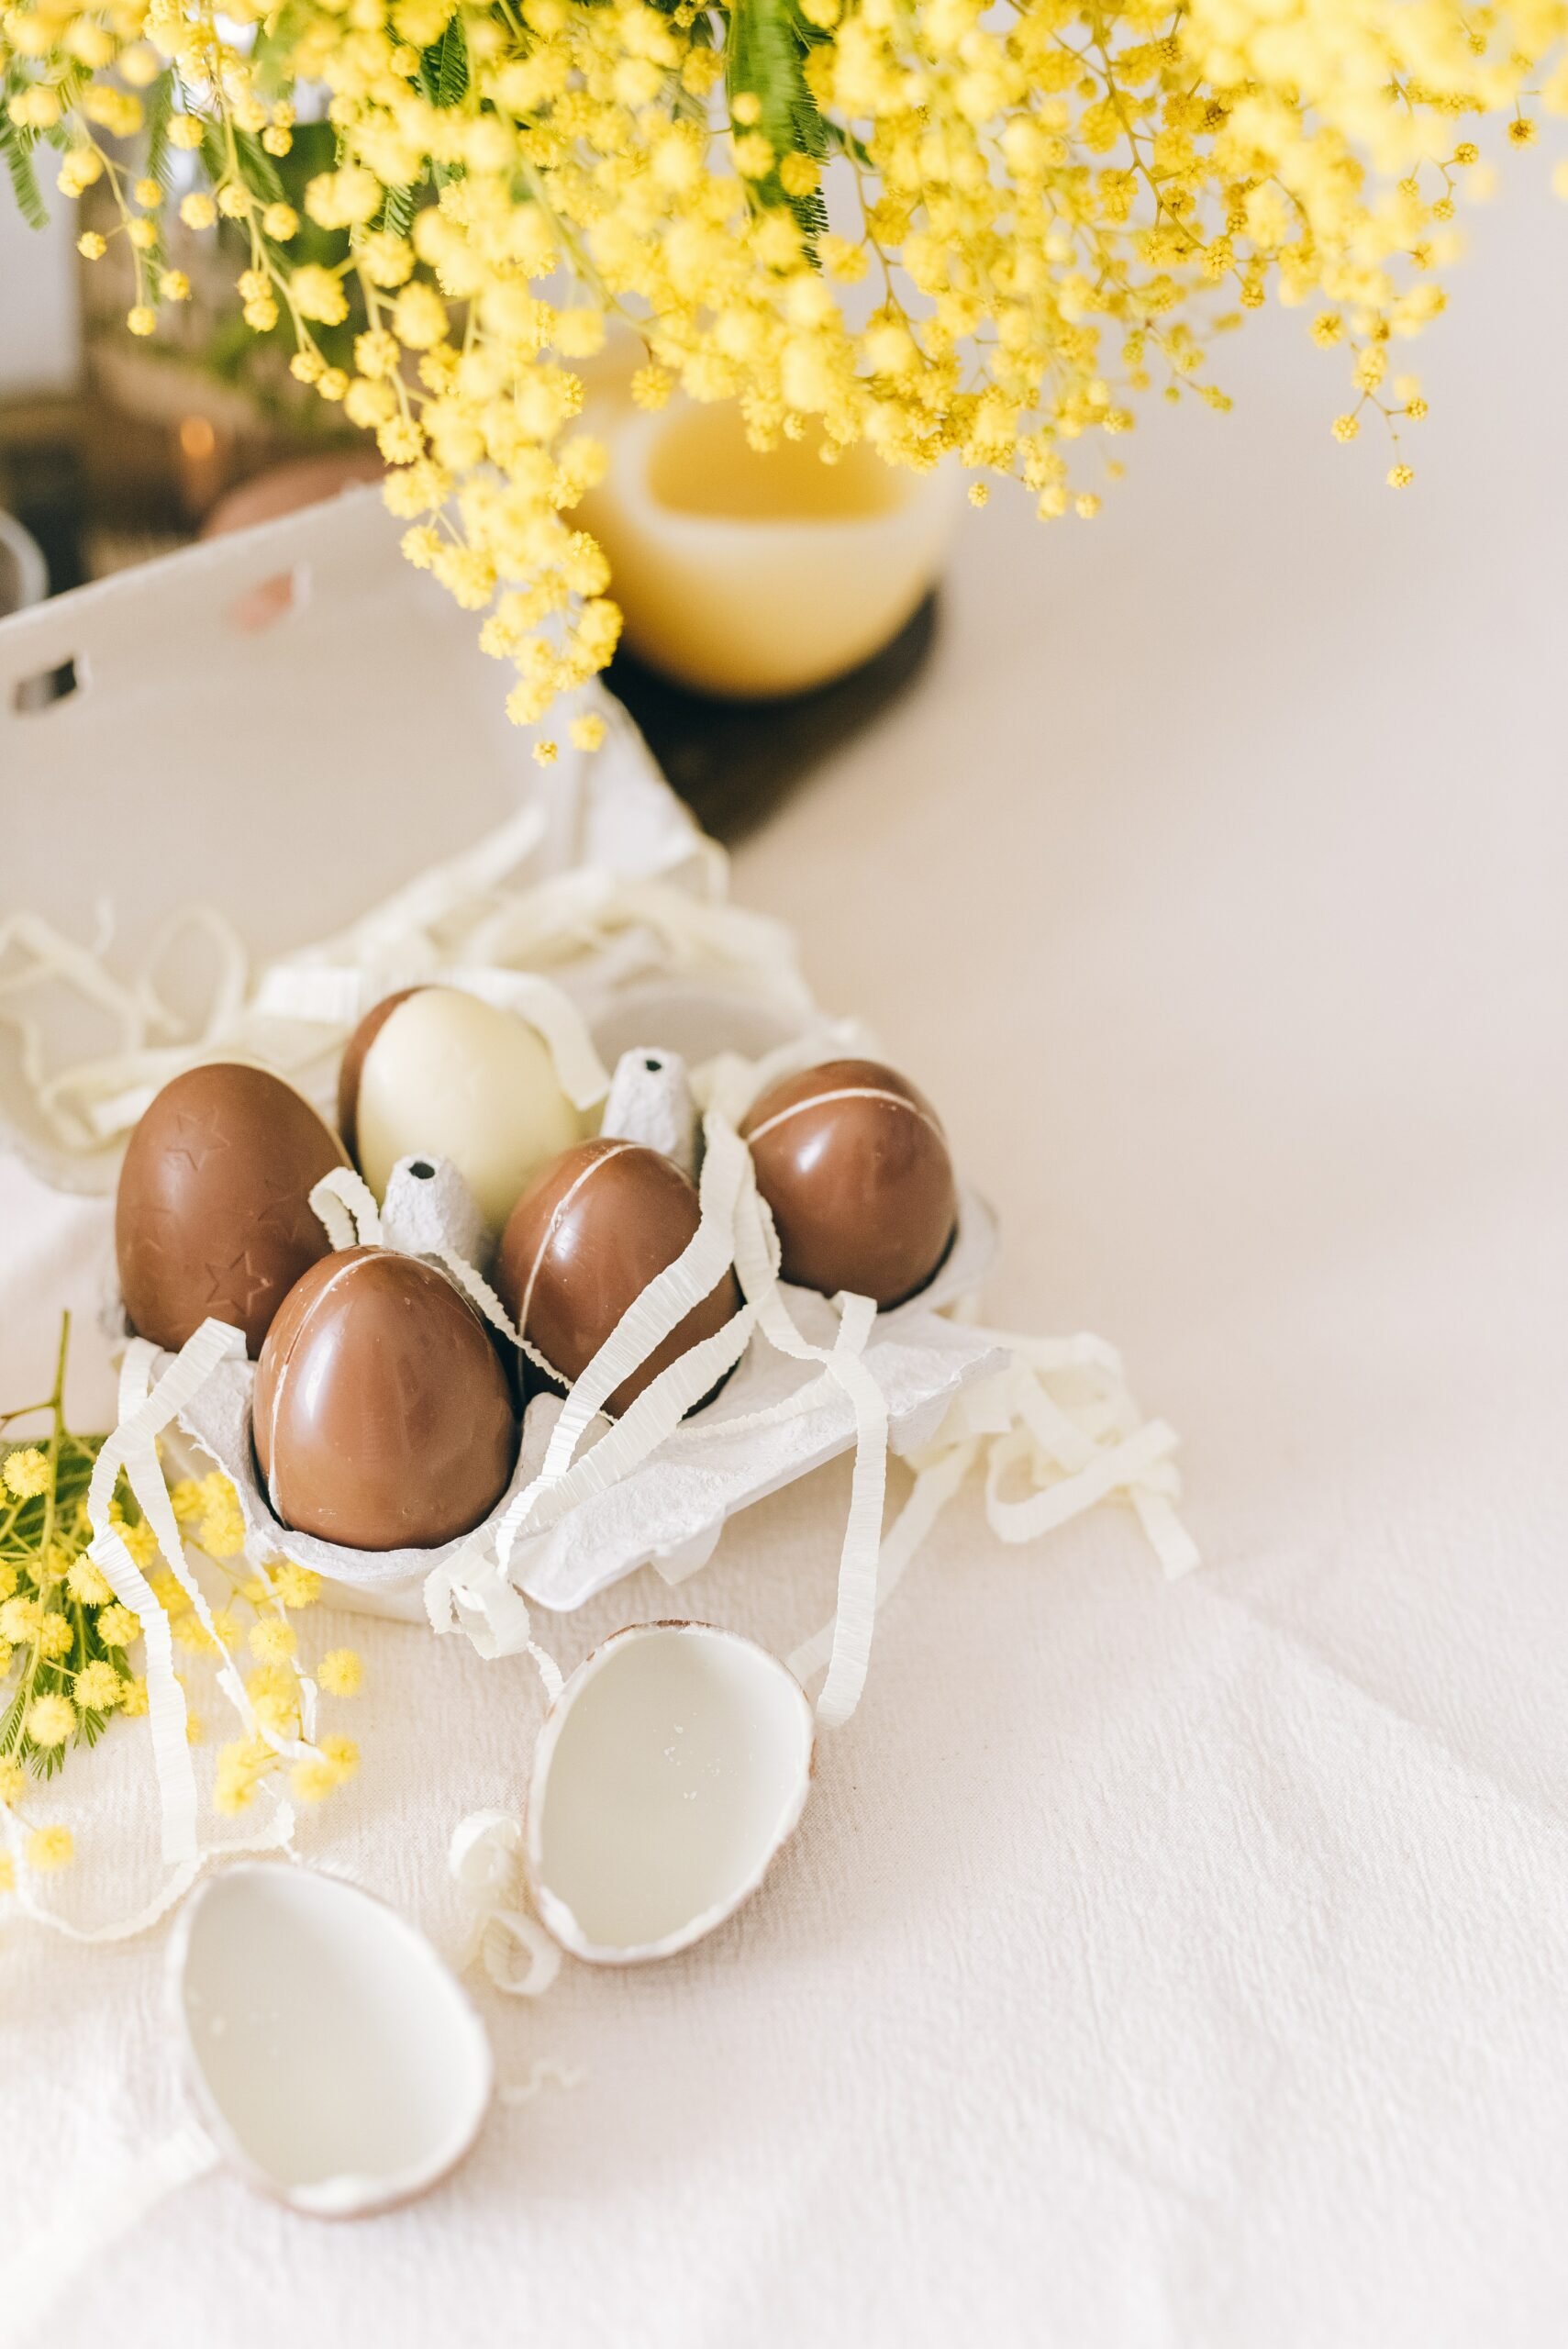 Chocolade Pasen